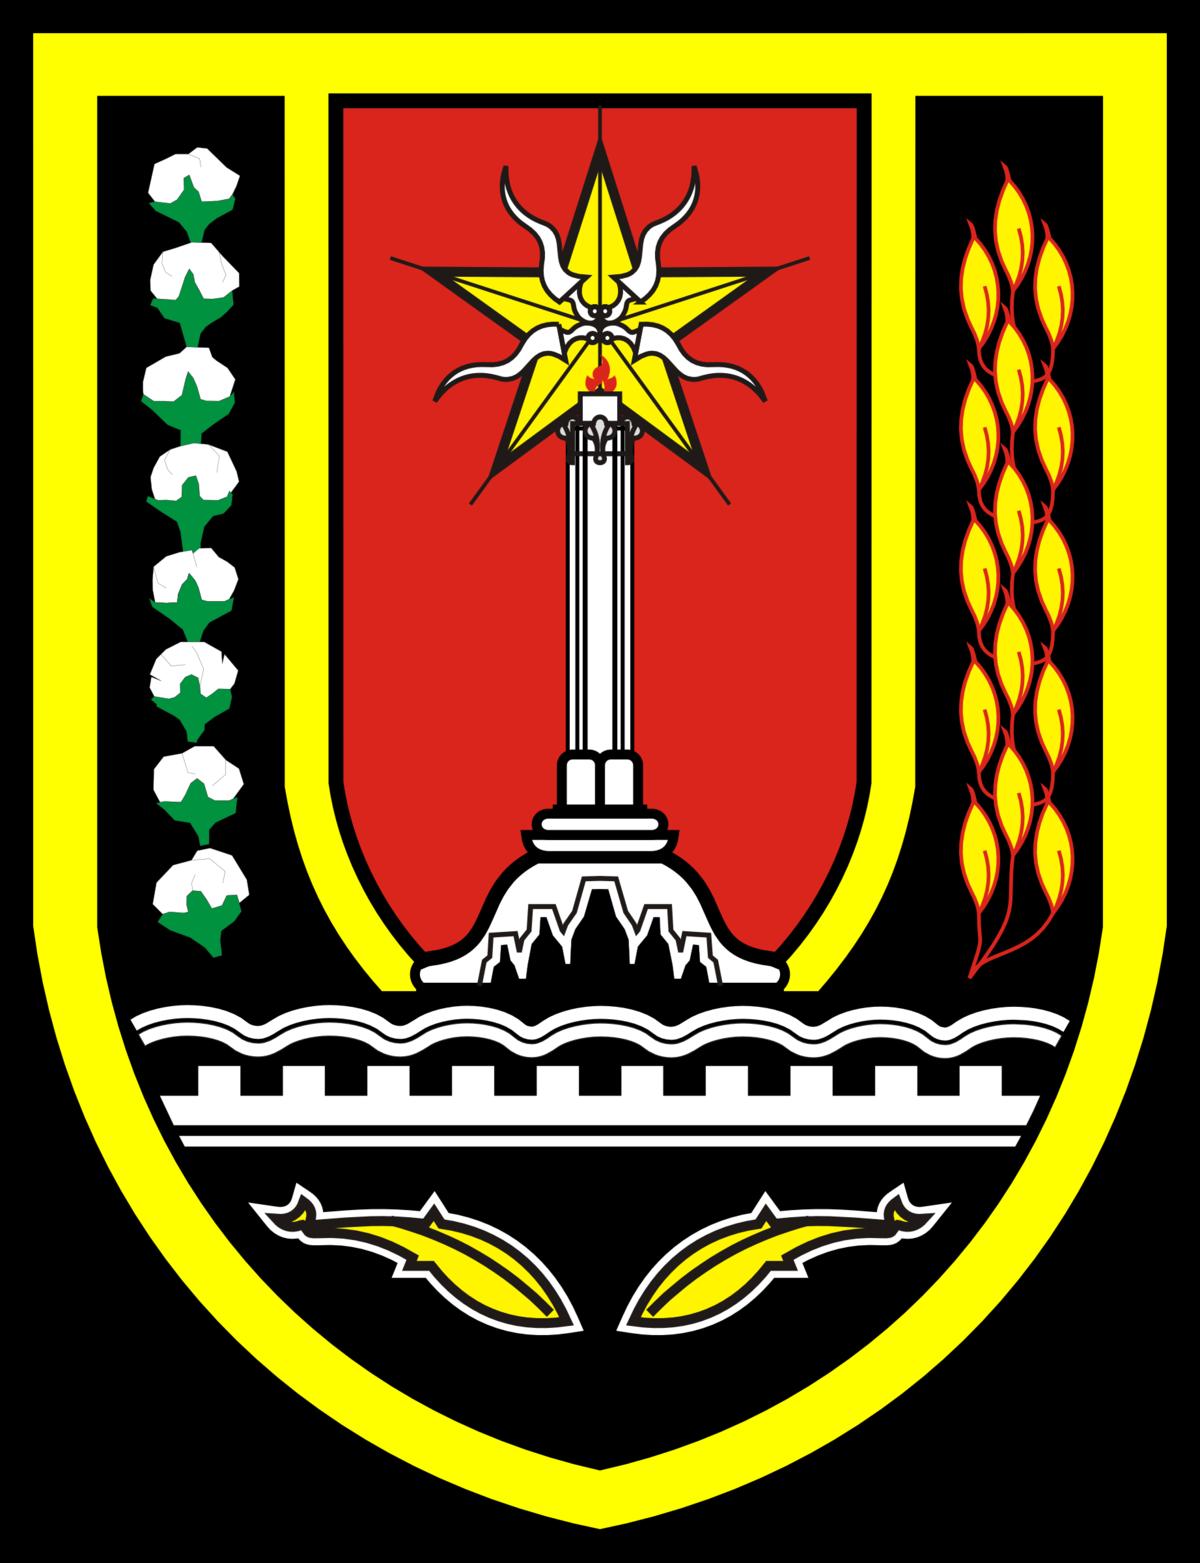 Berkas Lambang Kota Semarang Png Wikipedia Bahasa Indonesia Ensiklopedia Bebas